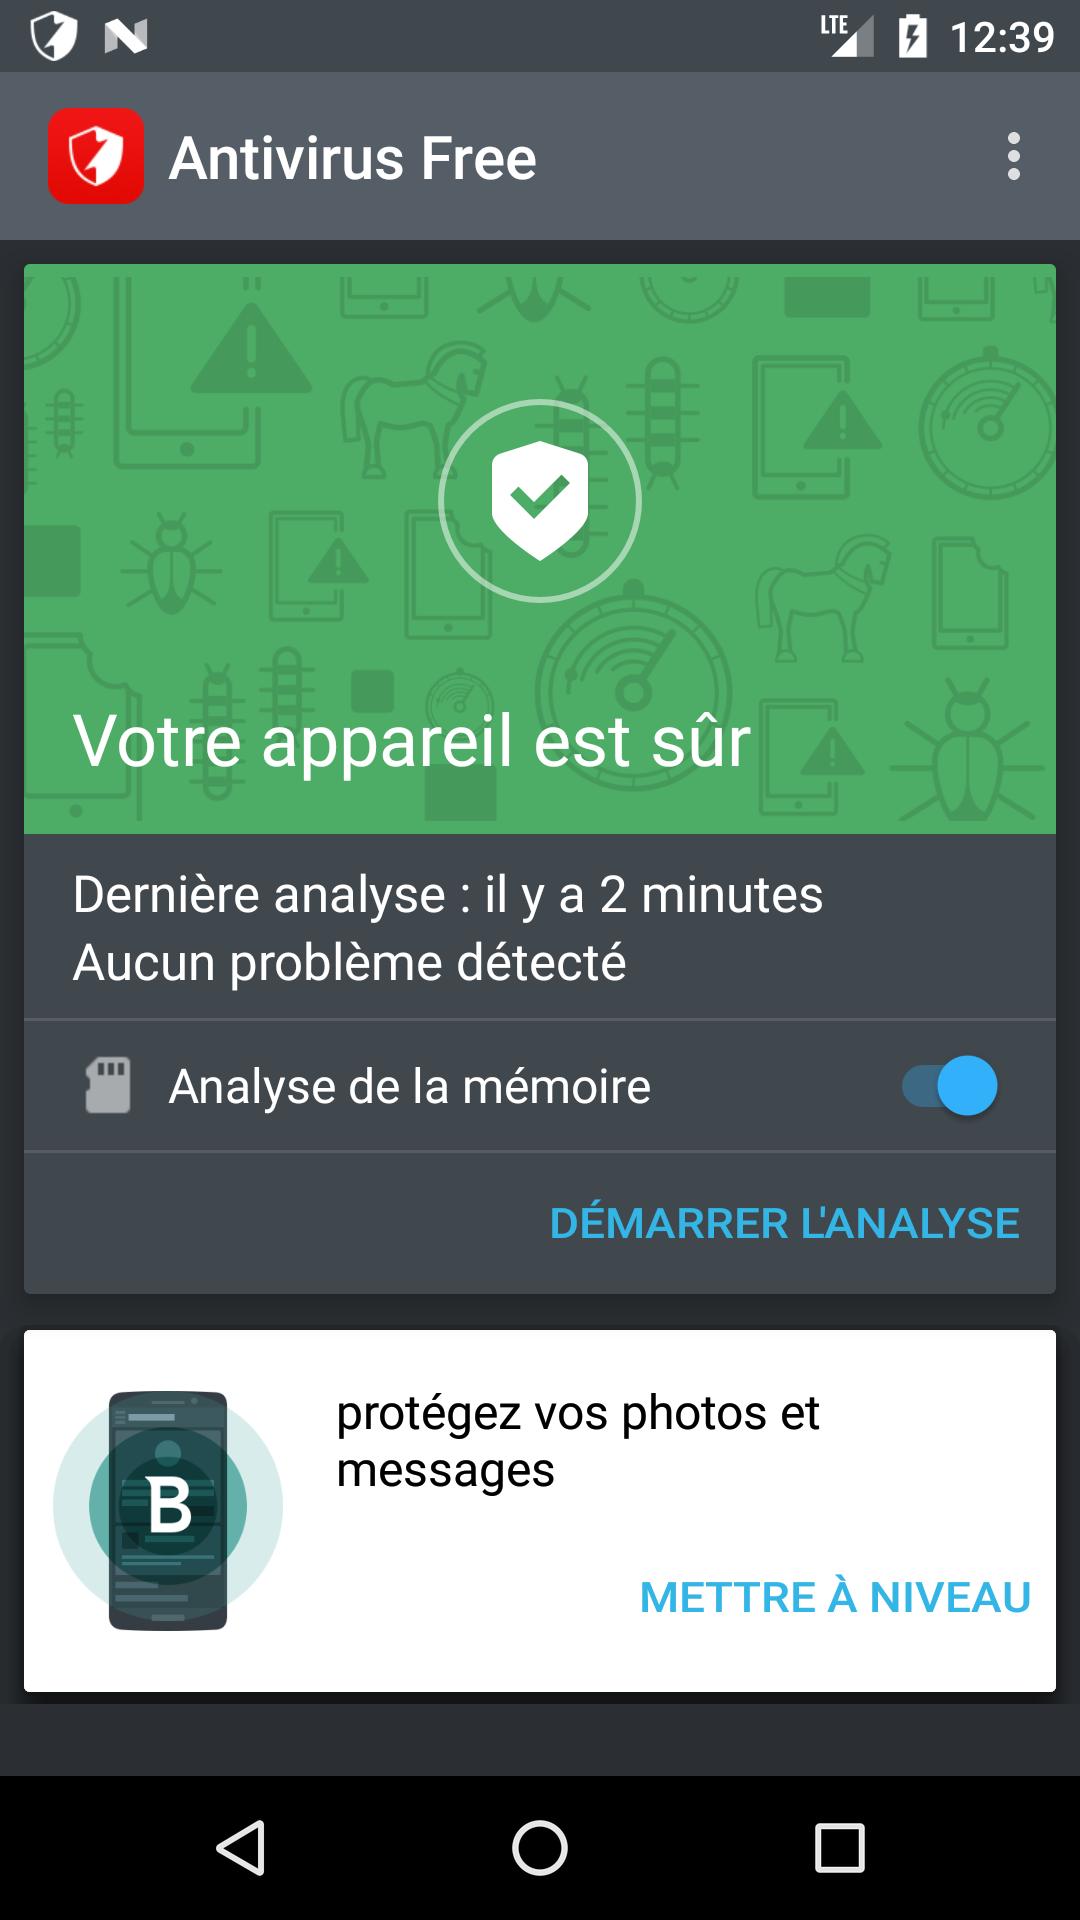 altavista antivirus gratuit